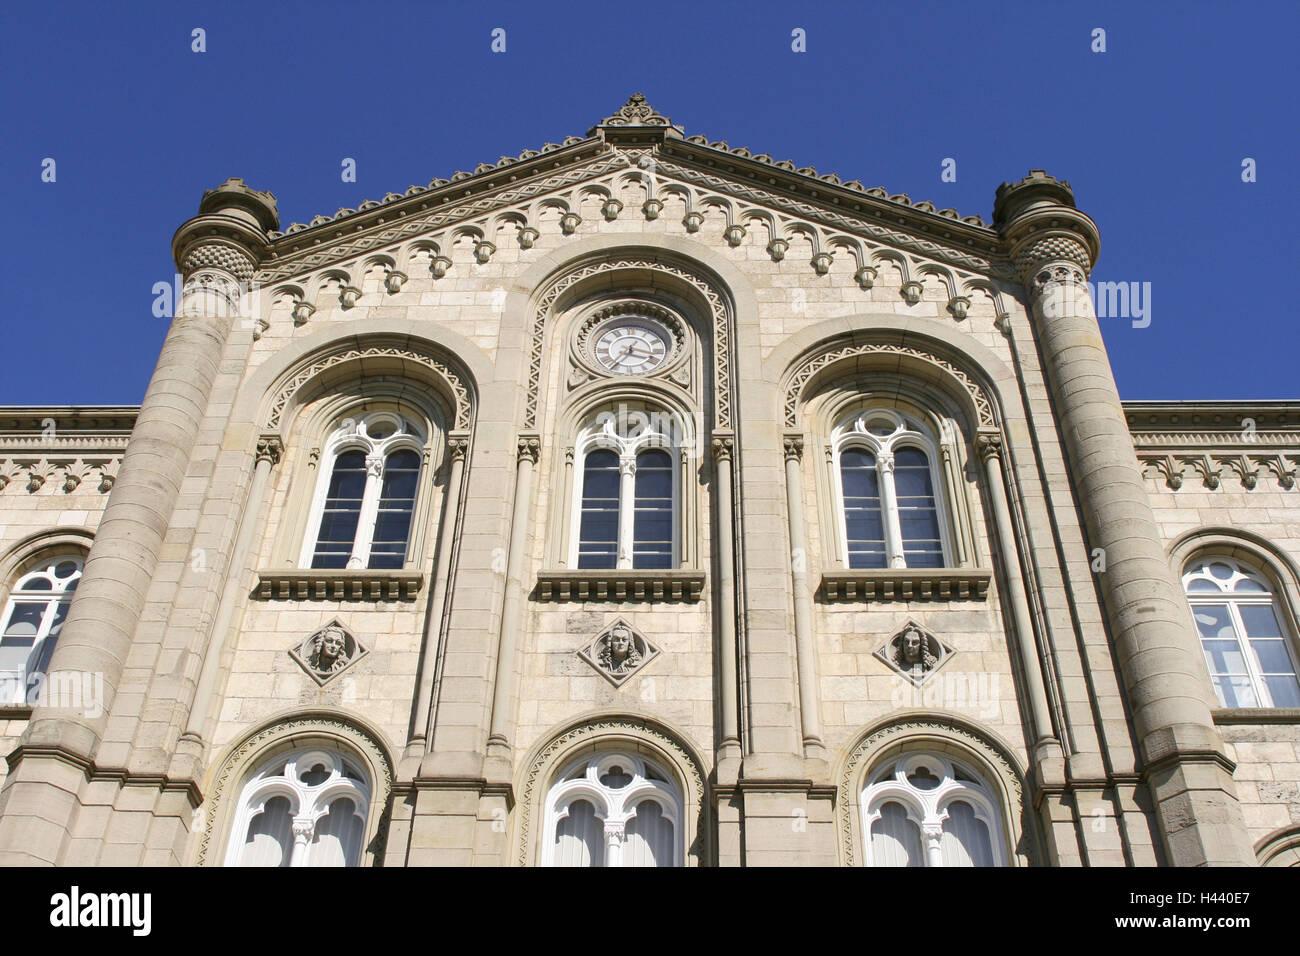 Germany, Lower Saxony, Goettingen, university, lecture hall maximum, detail, - Stock Image